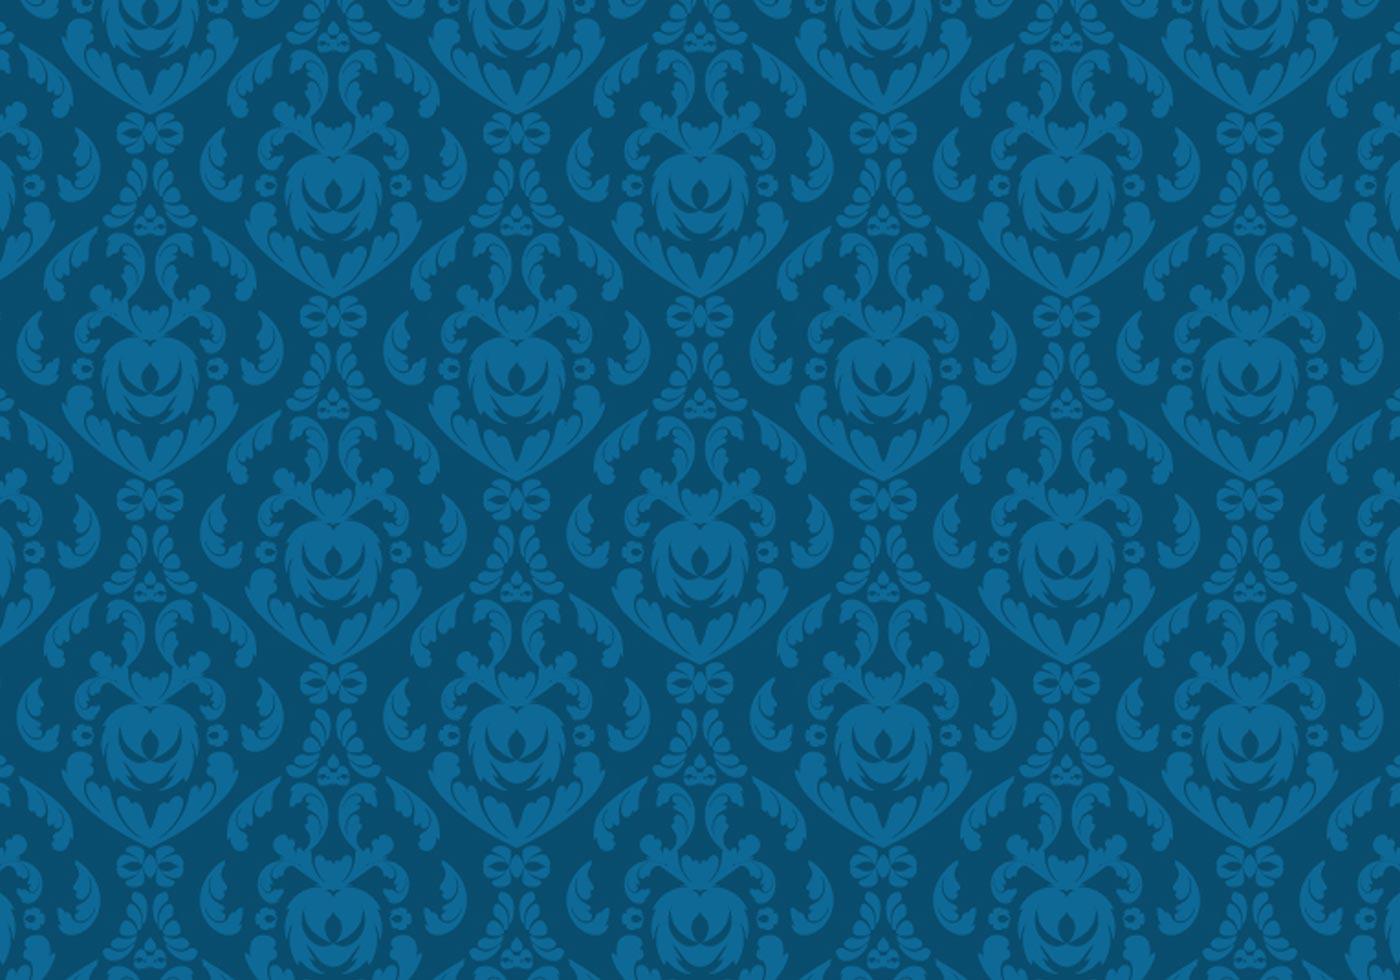 Decorative Wallpaper Pattern Free Photoshop Pattern At Brusheezy